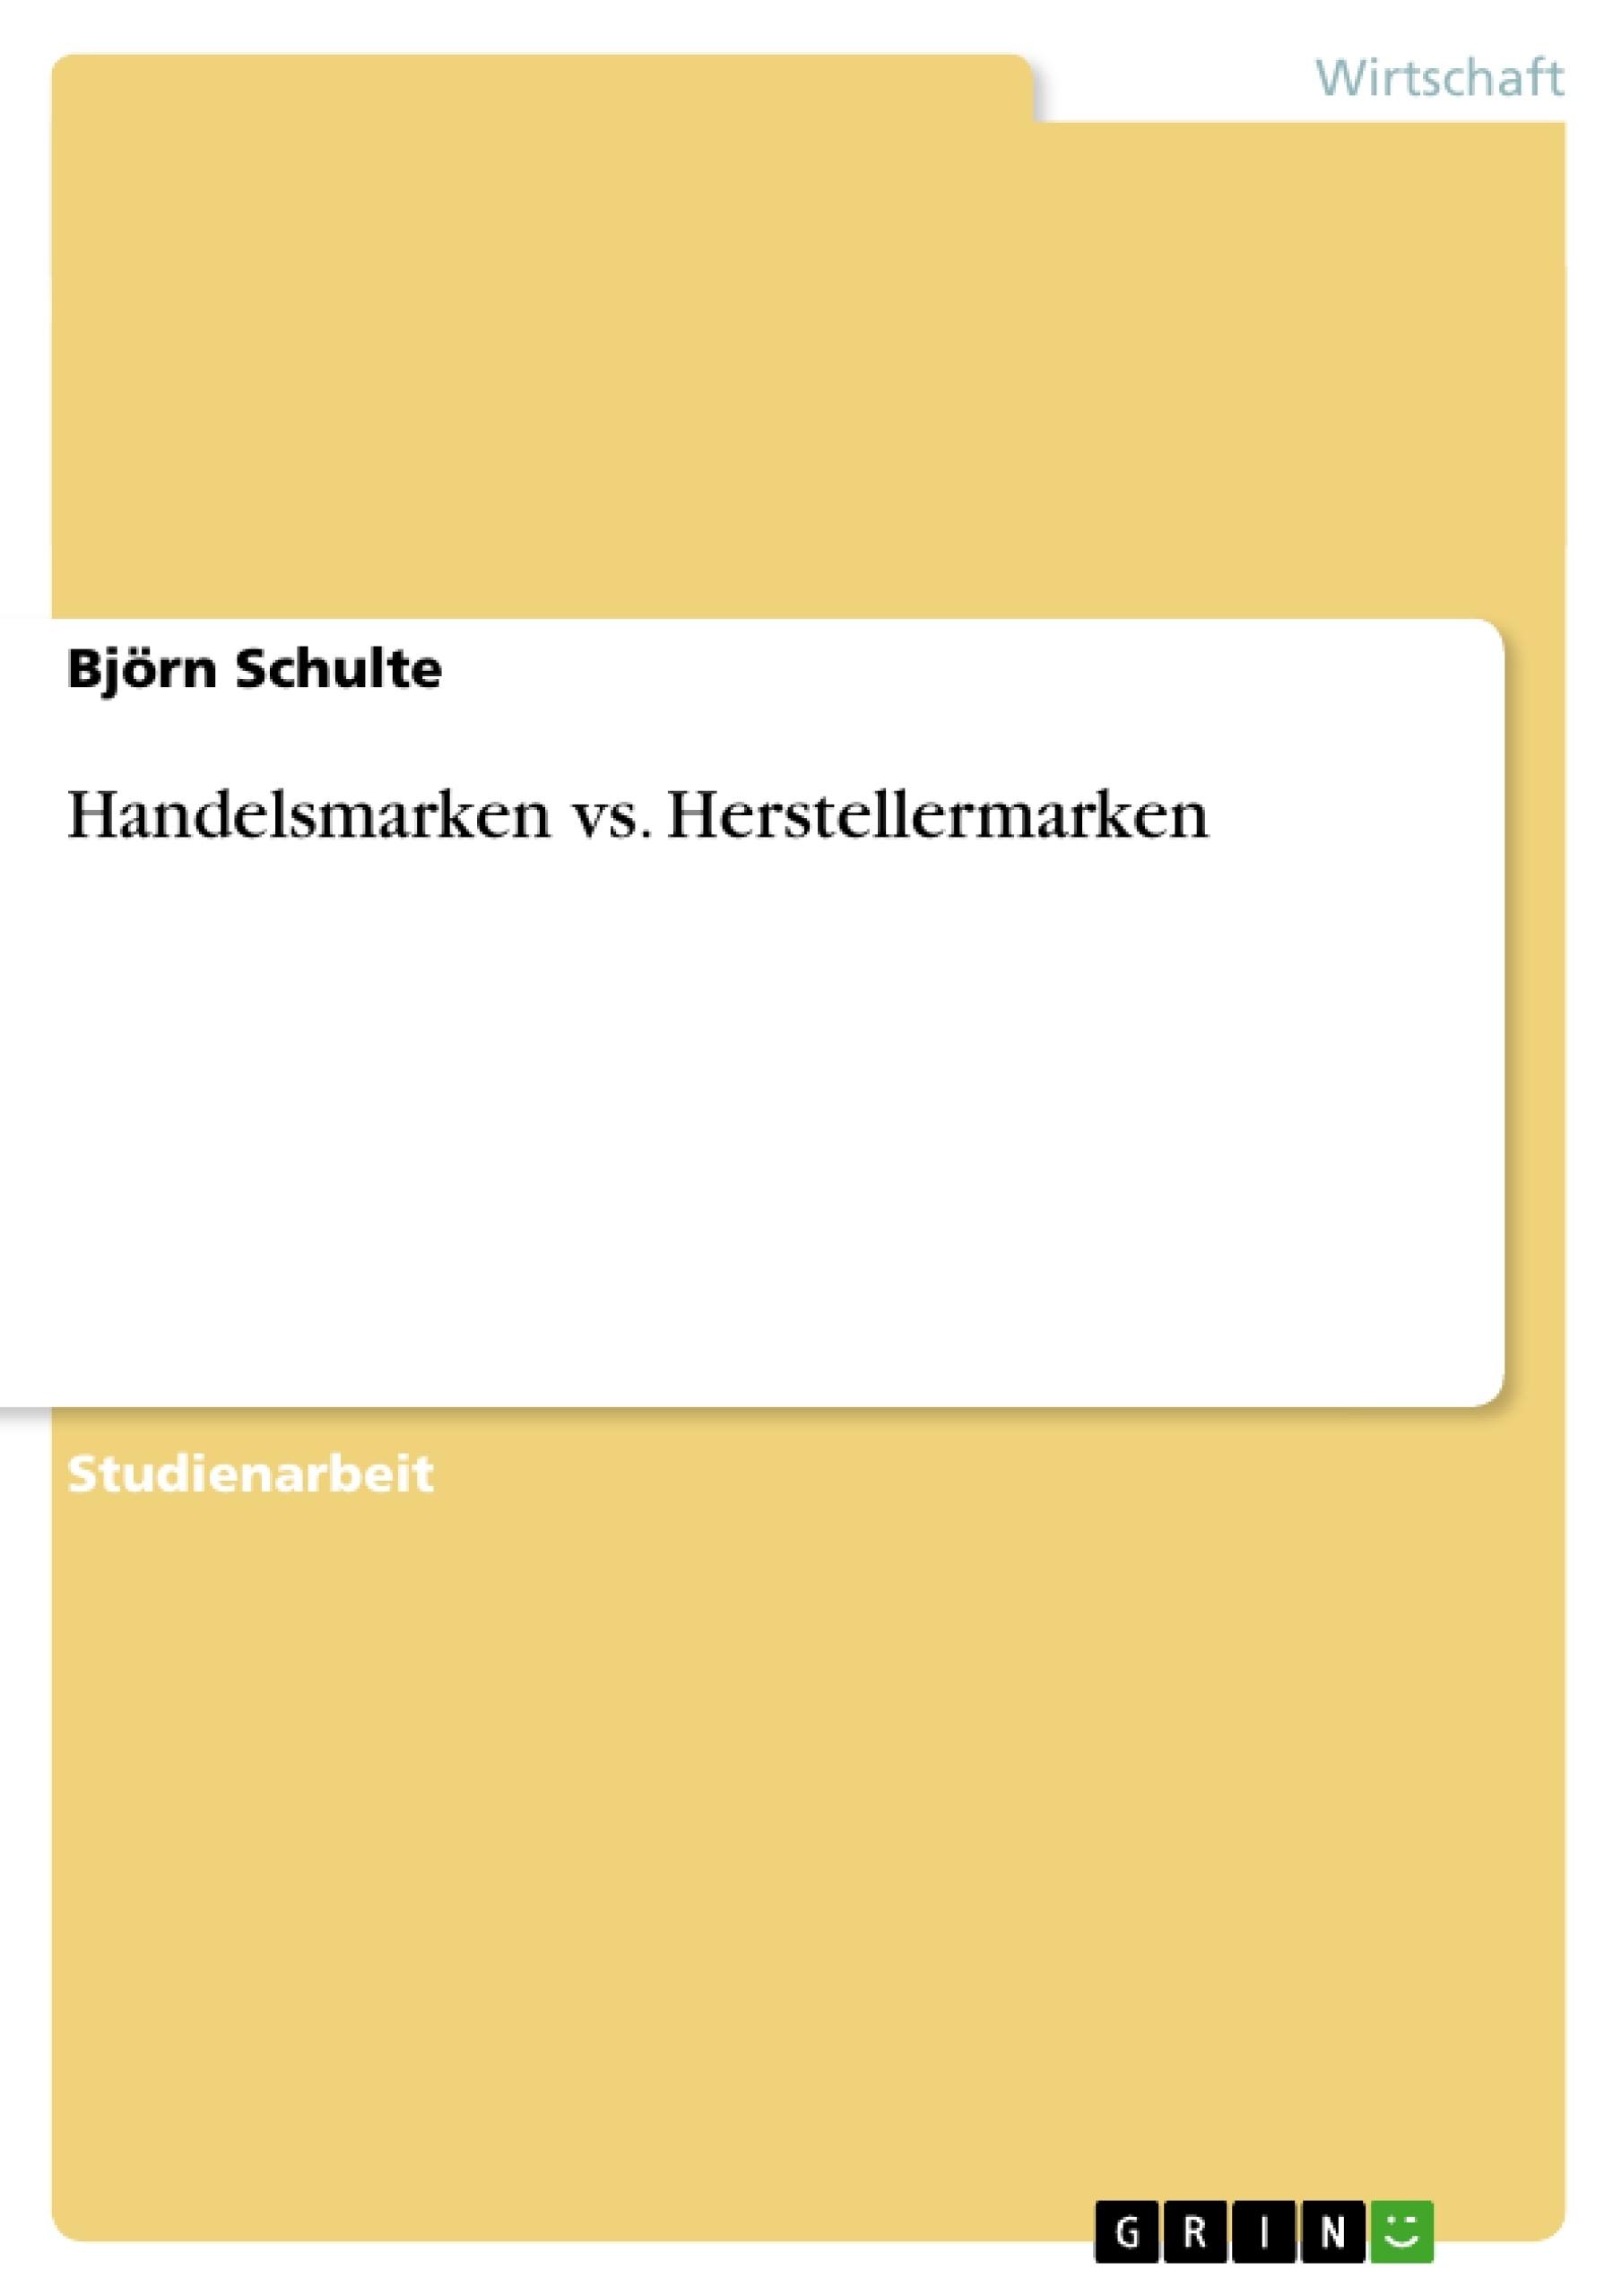 Titel: Handelsmarken vs. Herstellermarken